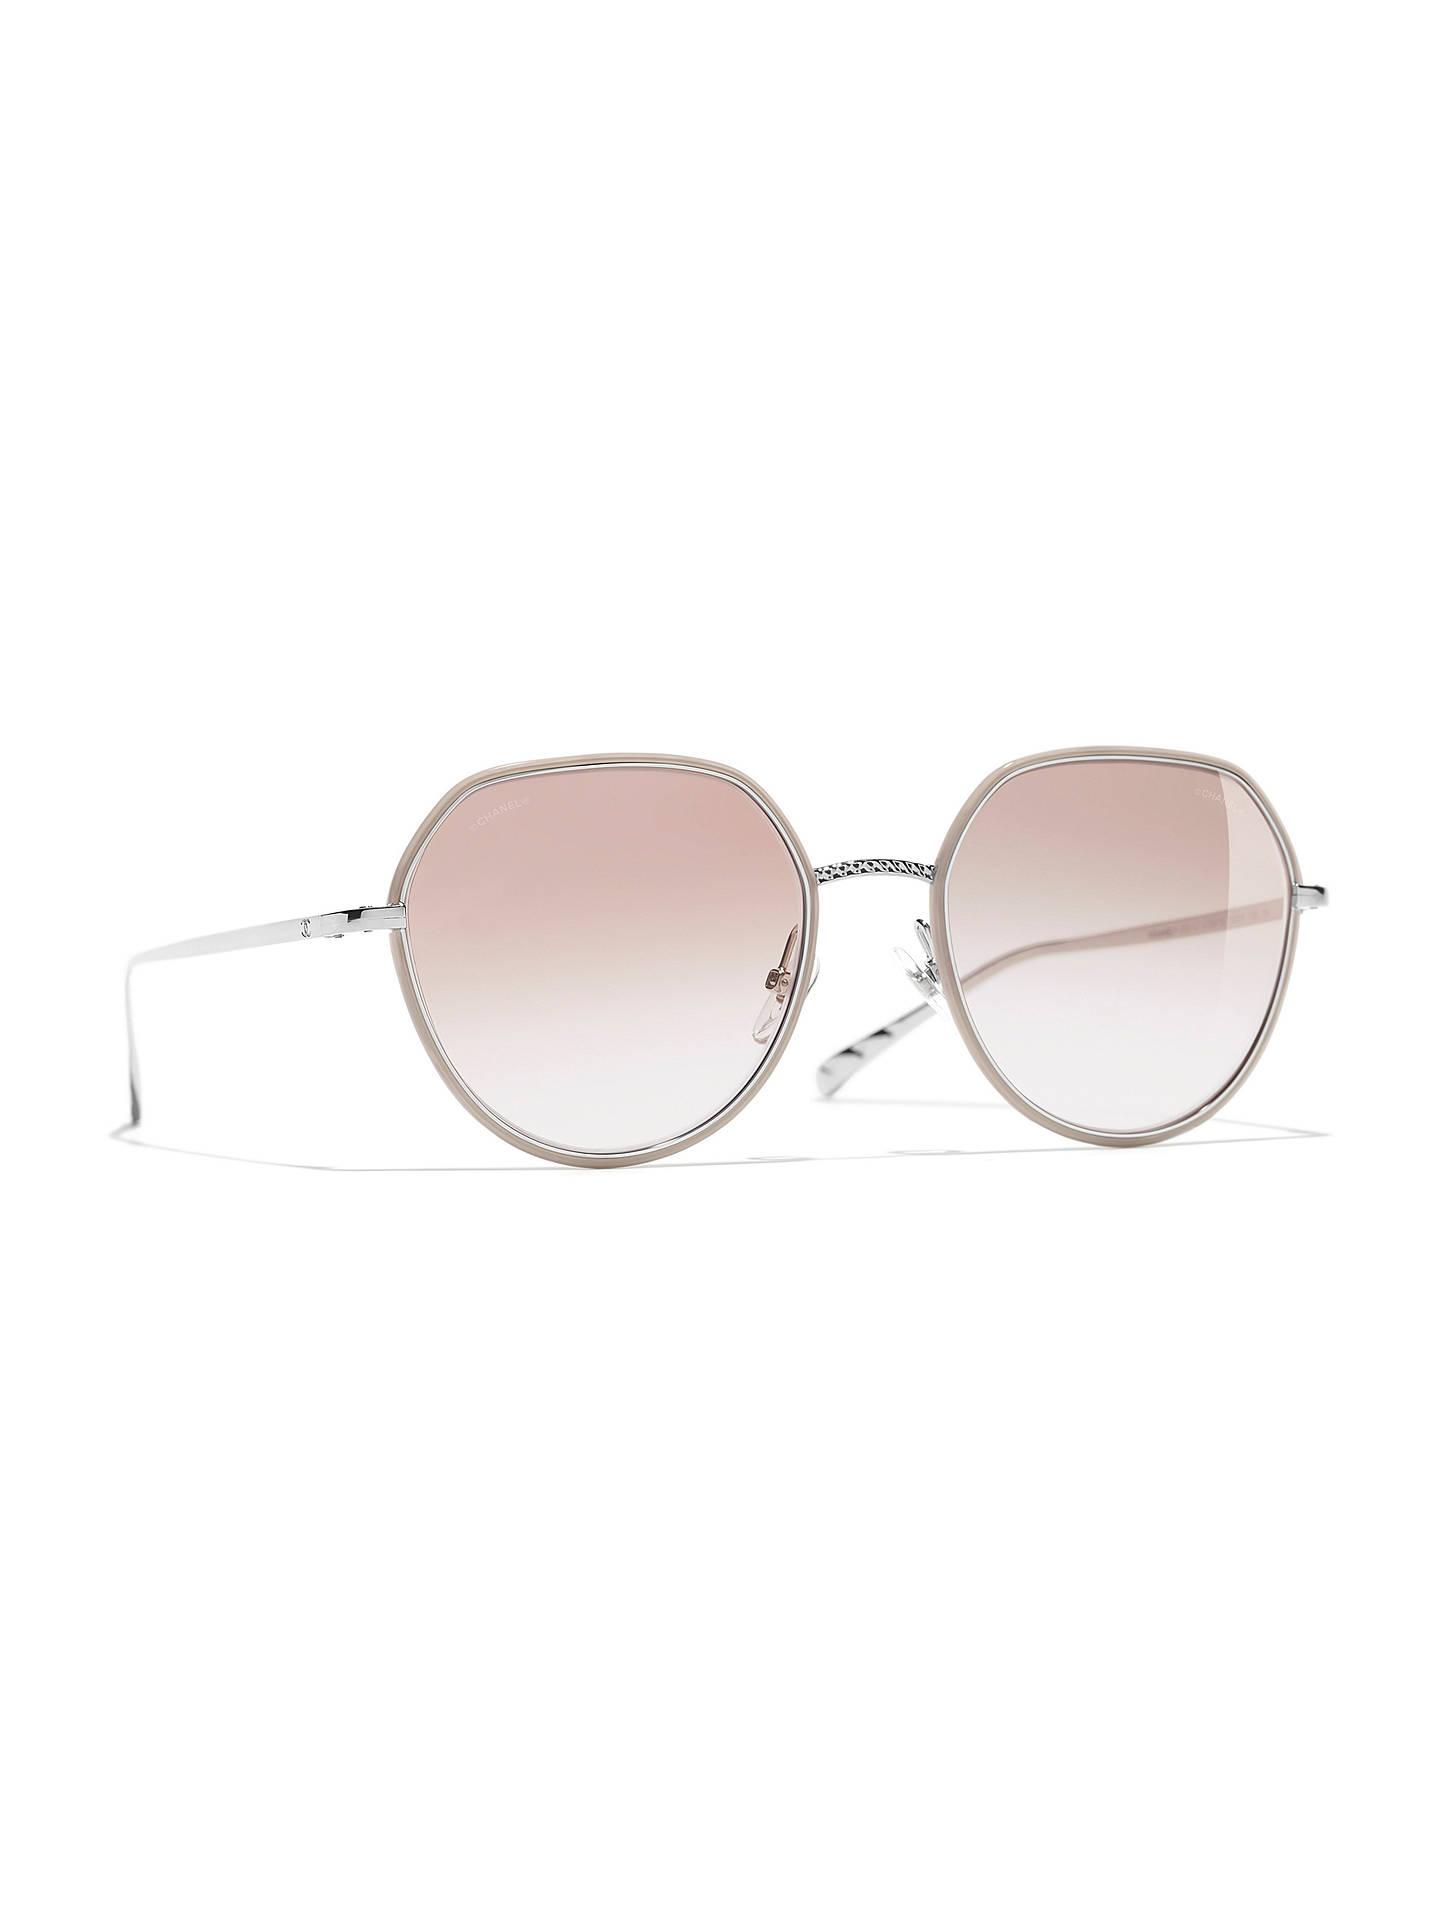 2d6035ca CHANEL Round Sunglasses CH4251J Silver/Beige Gradient